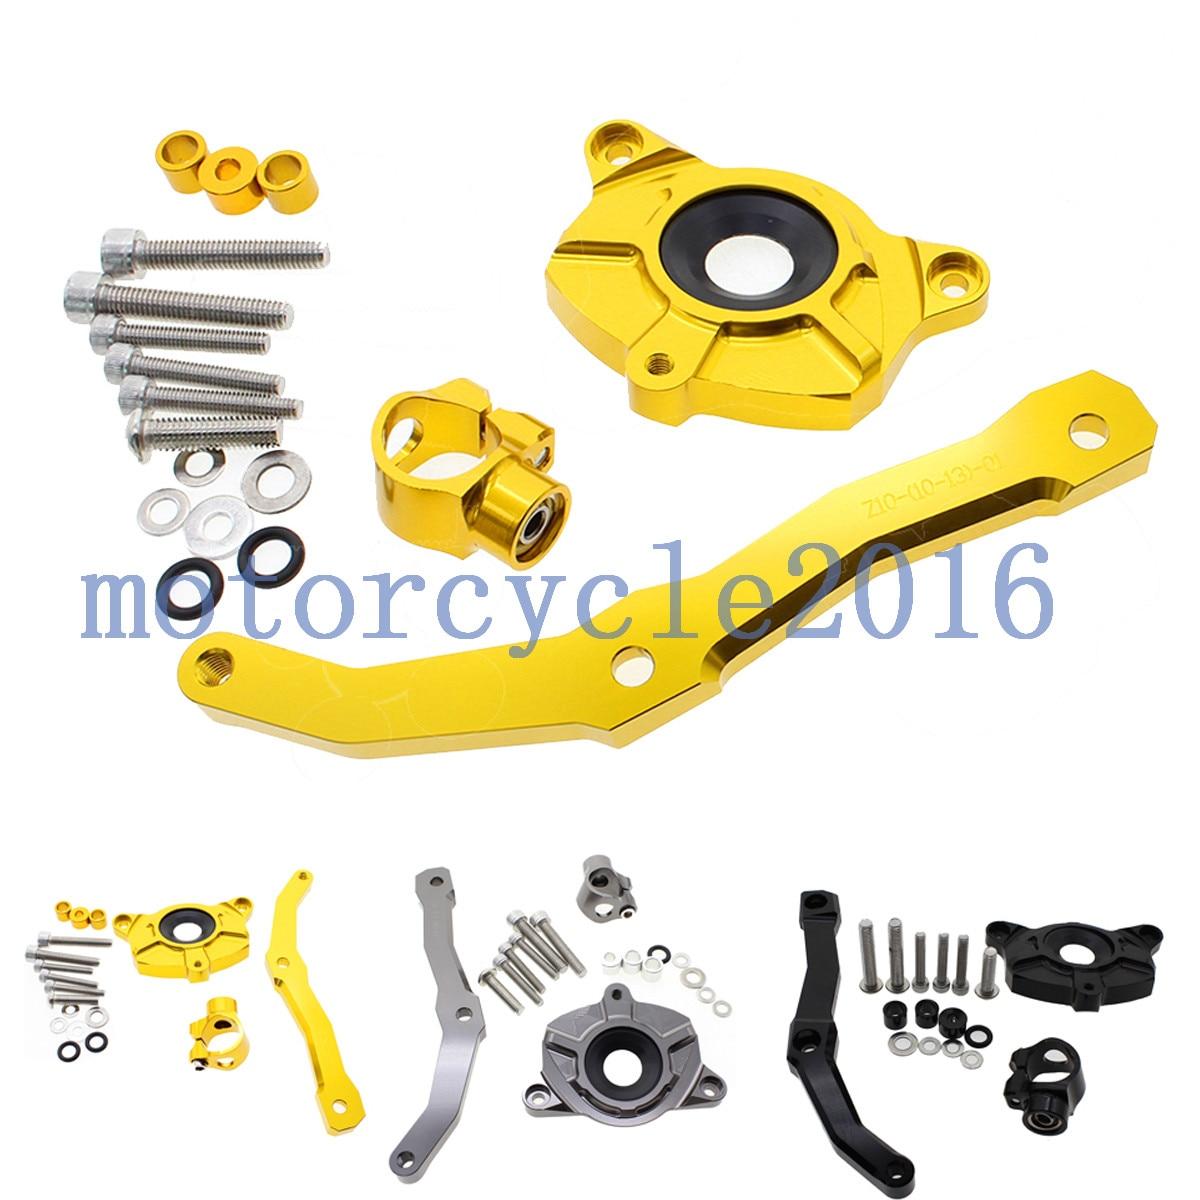 ФОТО Adjustable Steering Stabilize Damper bracket Mount kit For Kawasaki Z1000 2010 2011 2012 2013 T6061-T6 Aluminum A set CNC FXCNC